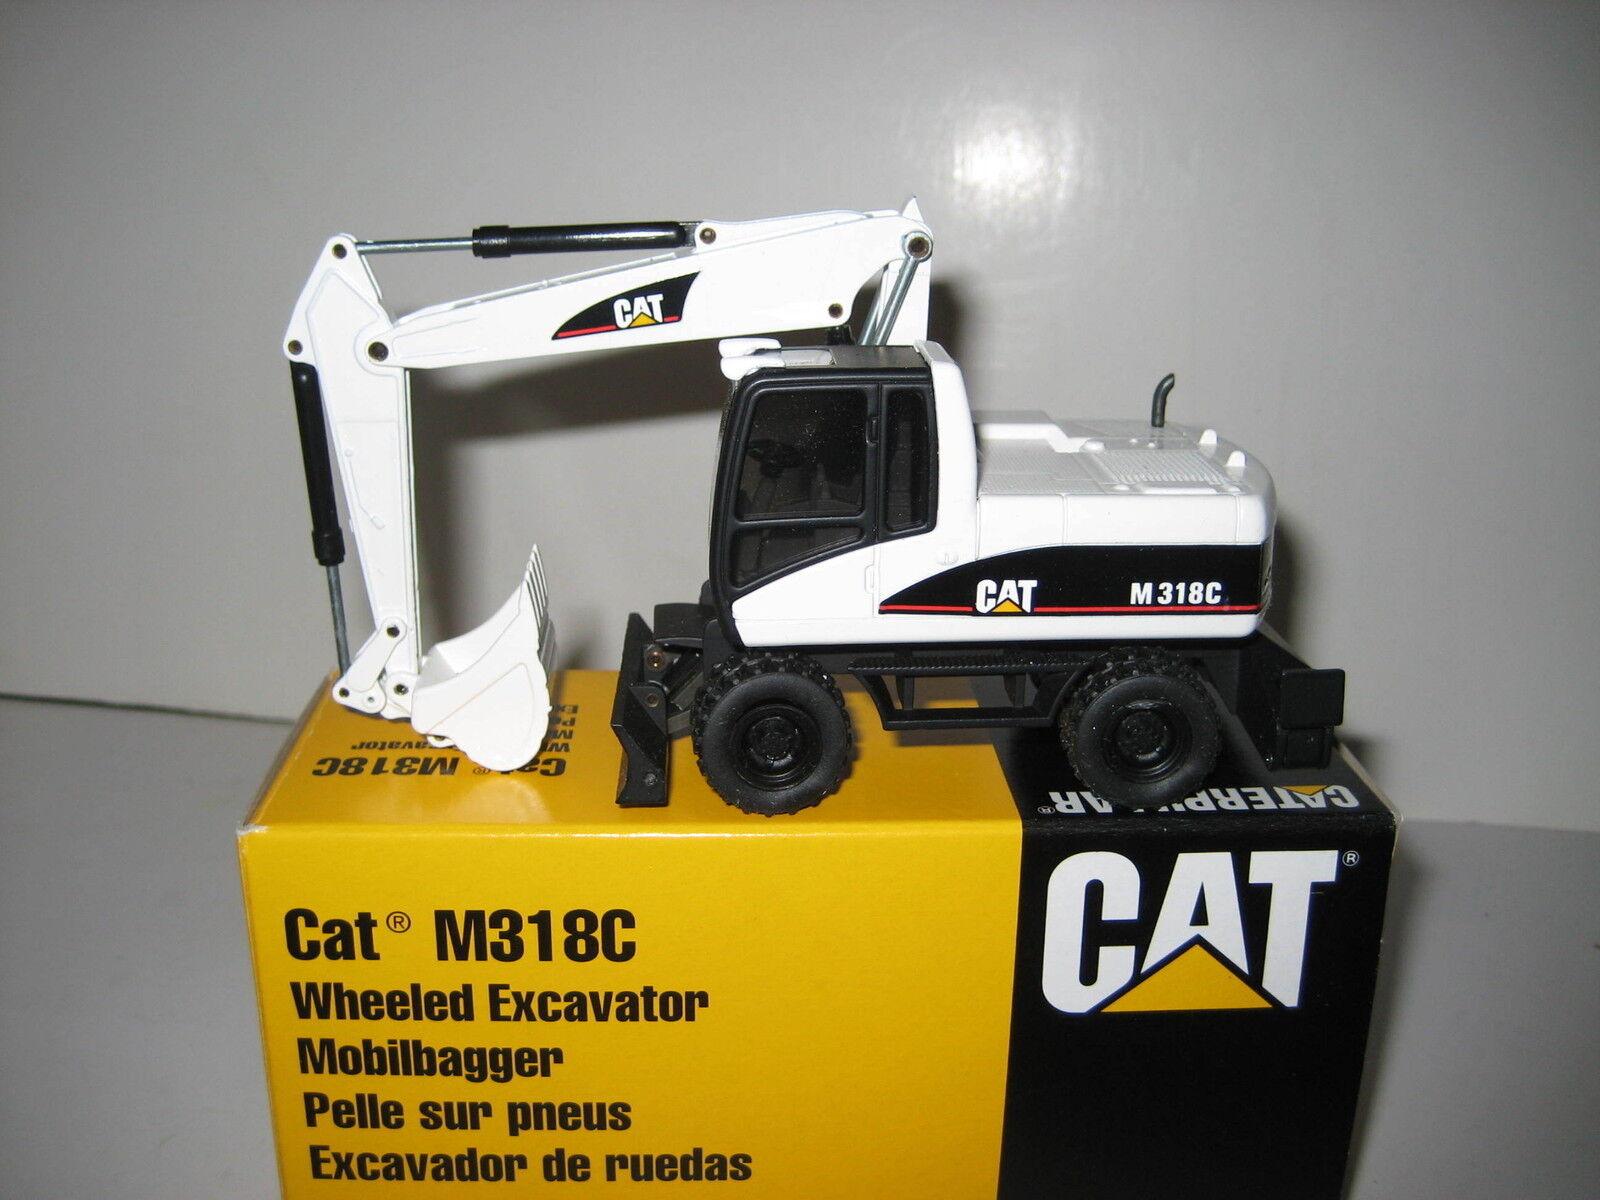 Caterpillar M 318 C Excavateurs tieflöffel Blanc  516.2 NZG 1 50 neuf dans sa boîte